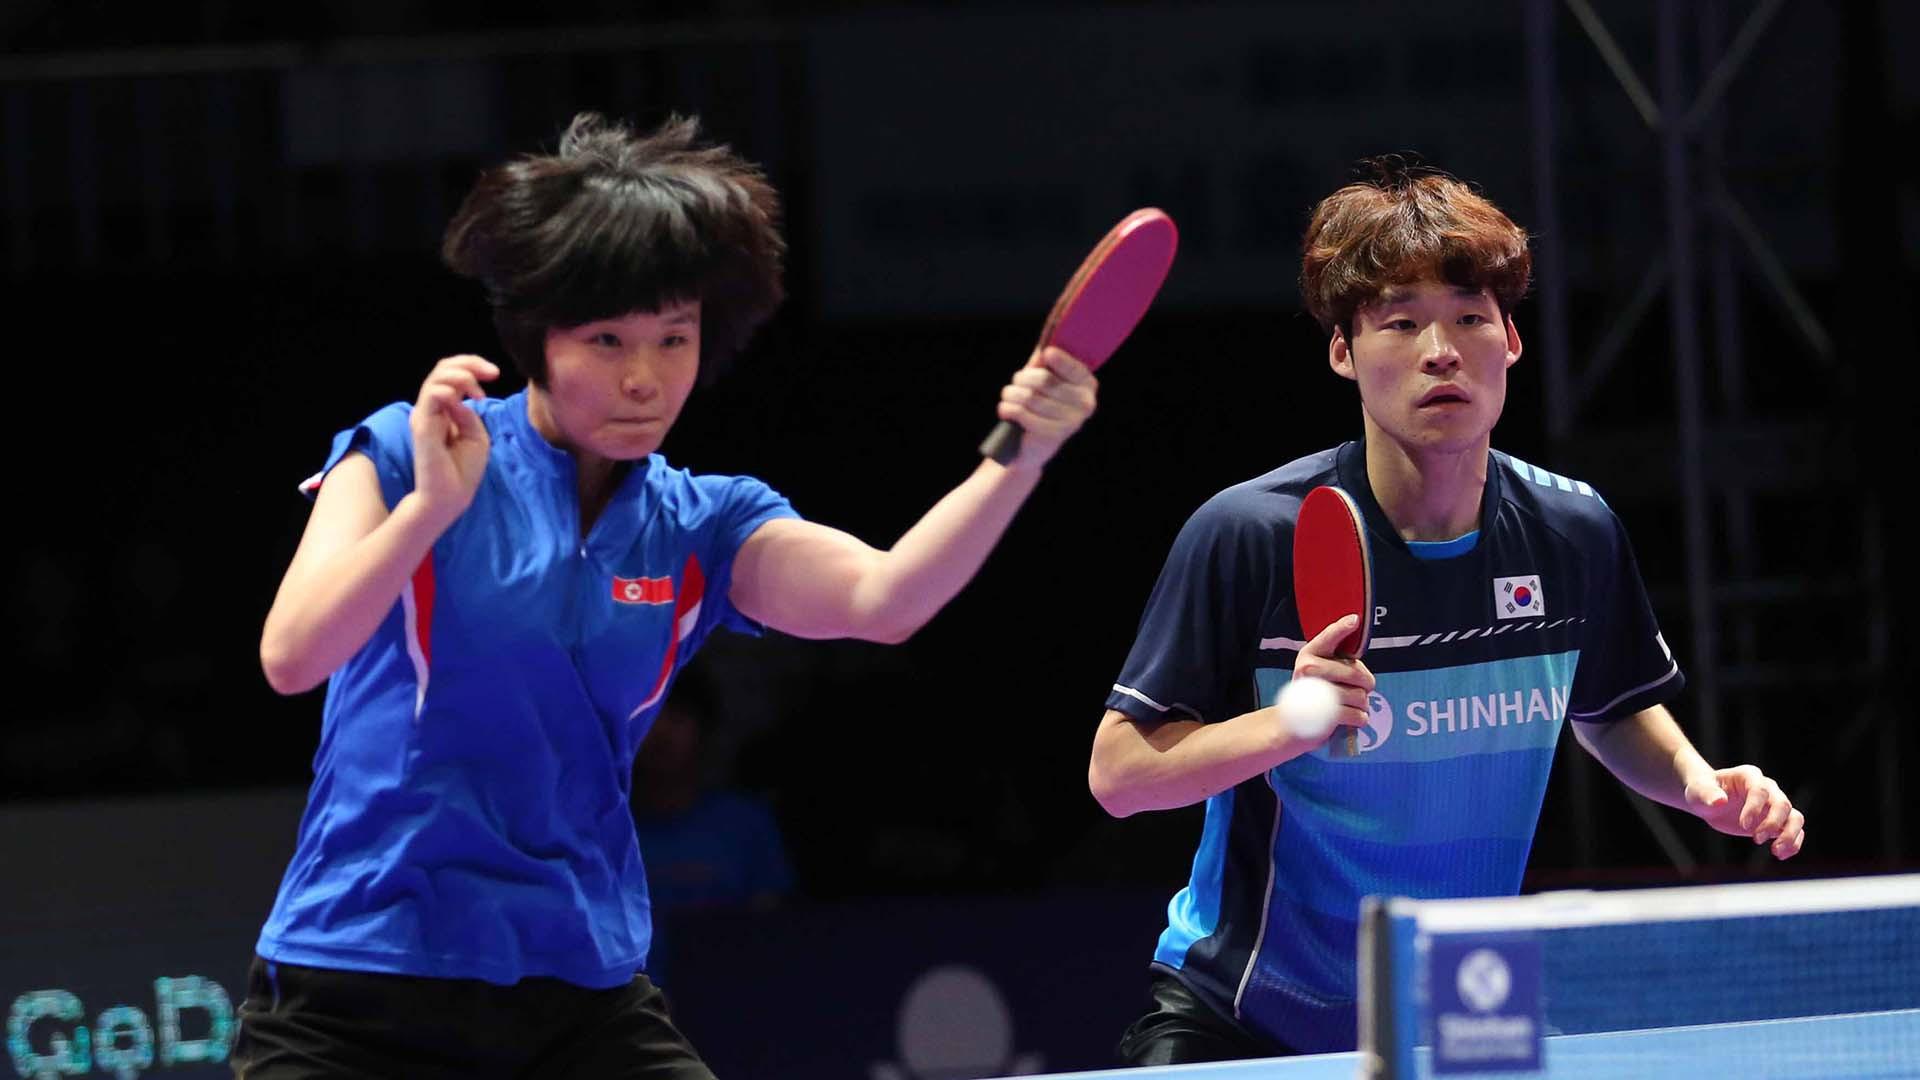 Unified Korean pairing reach mixed doubles final at ITTF World Tour Grand Finals